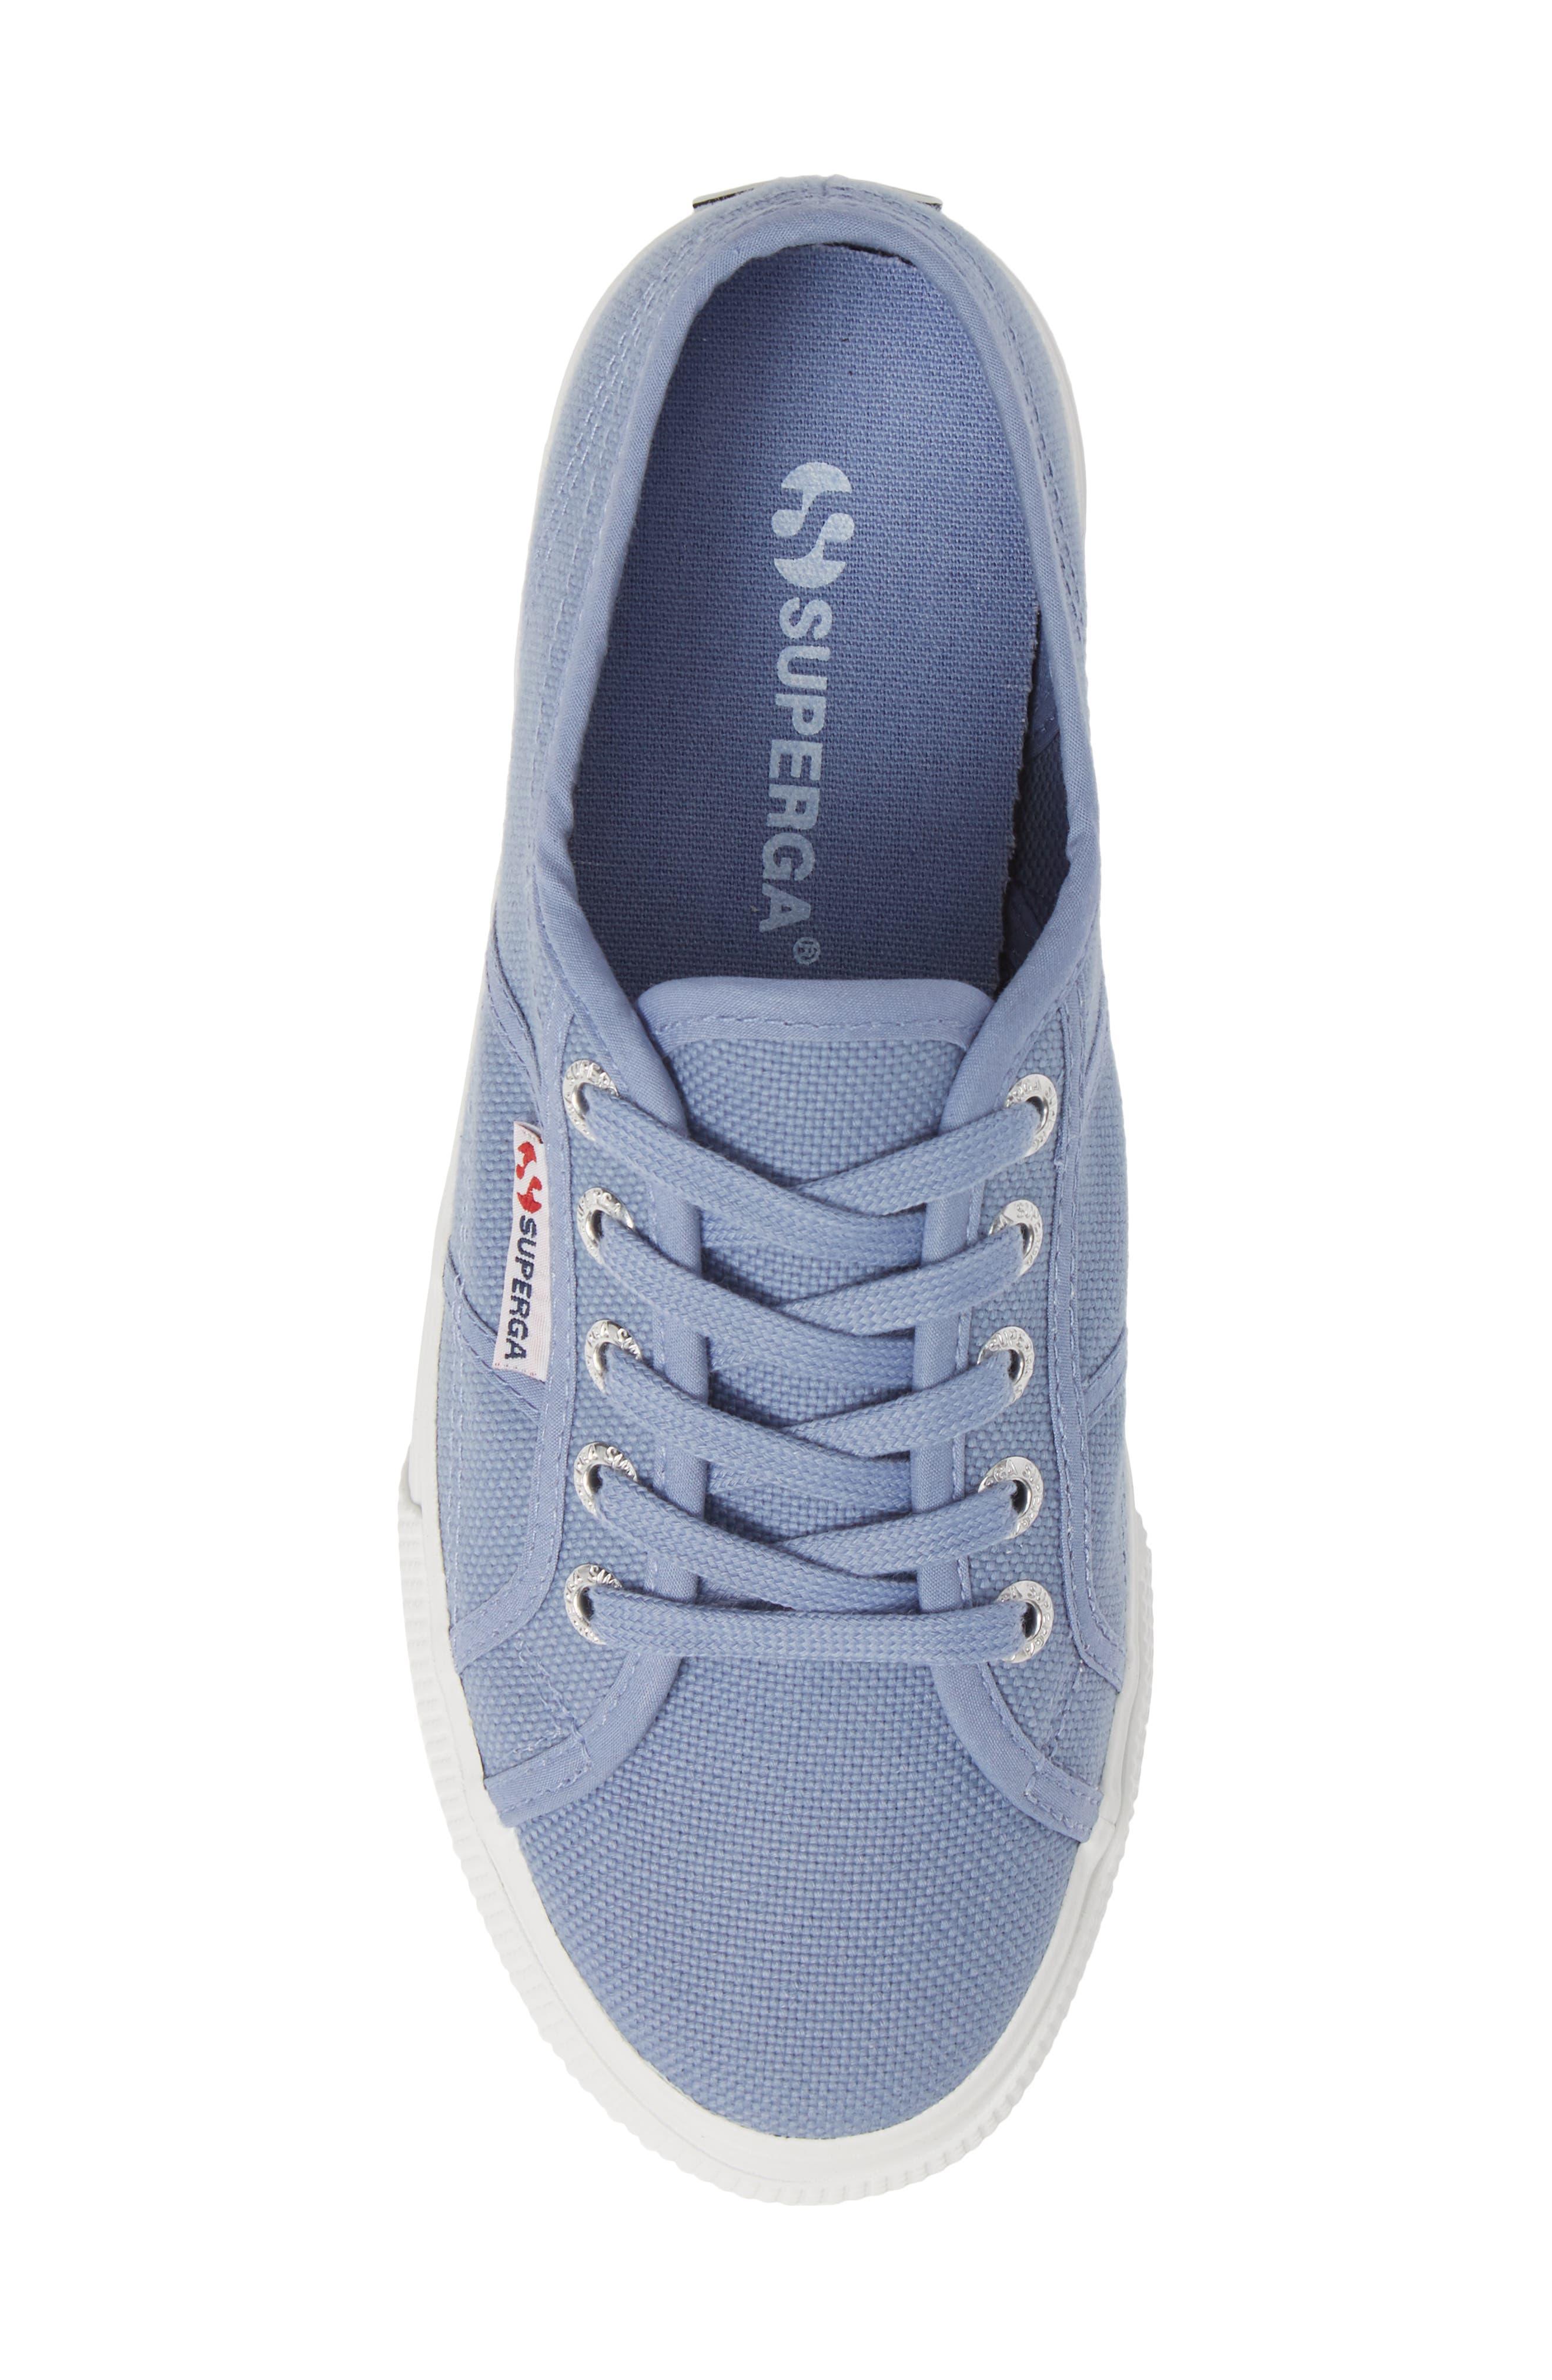 'Acot Linea' Sneaker,                             Alternate thumbnail 5, color,                             BLUE/ LIGHT PURPLE